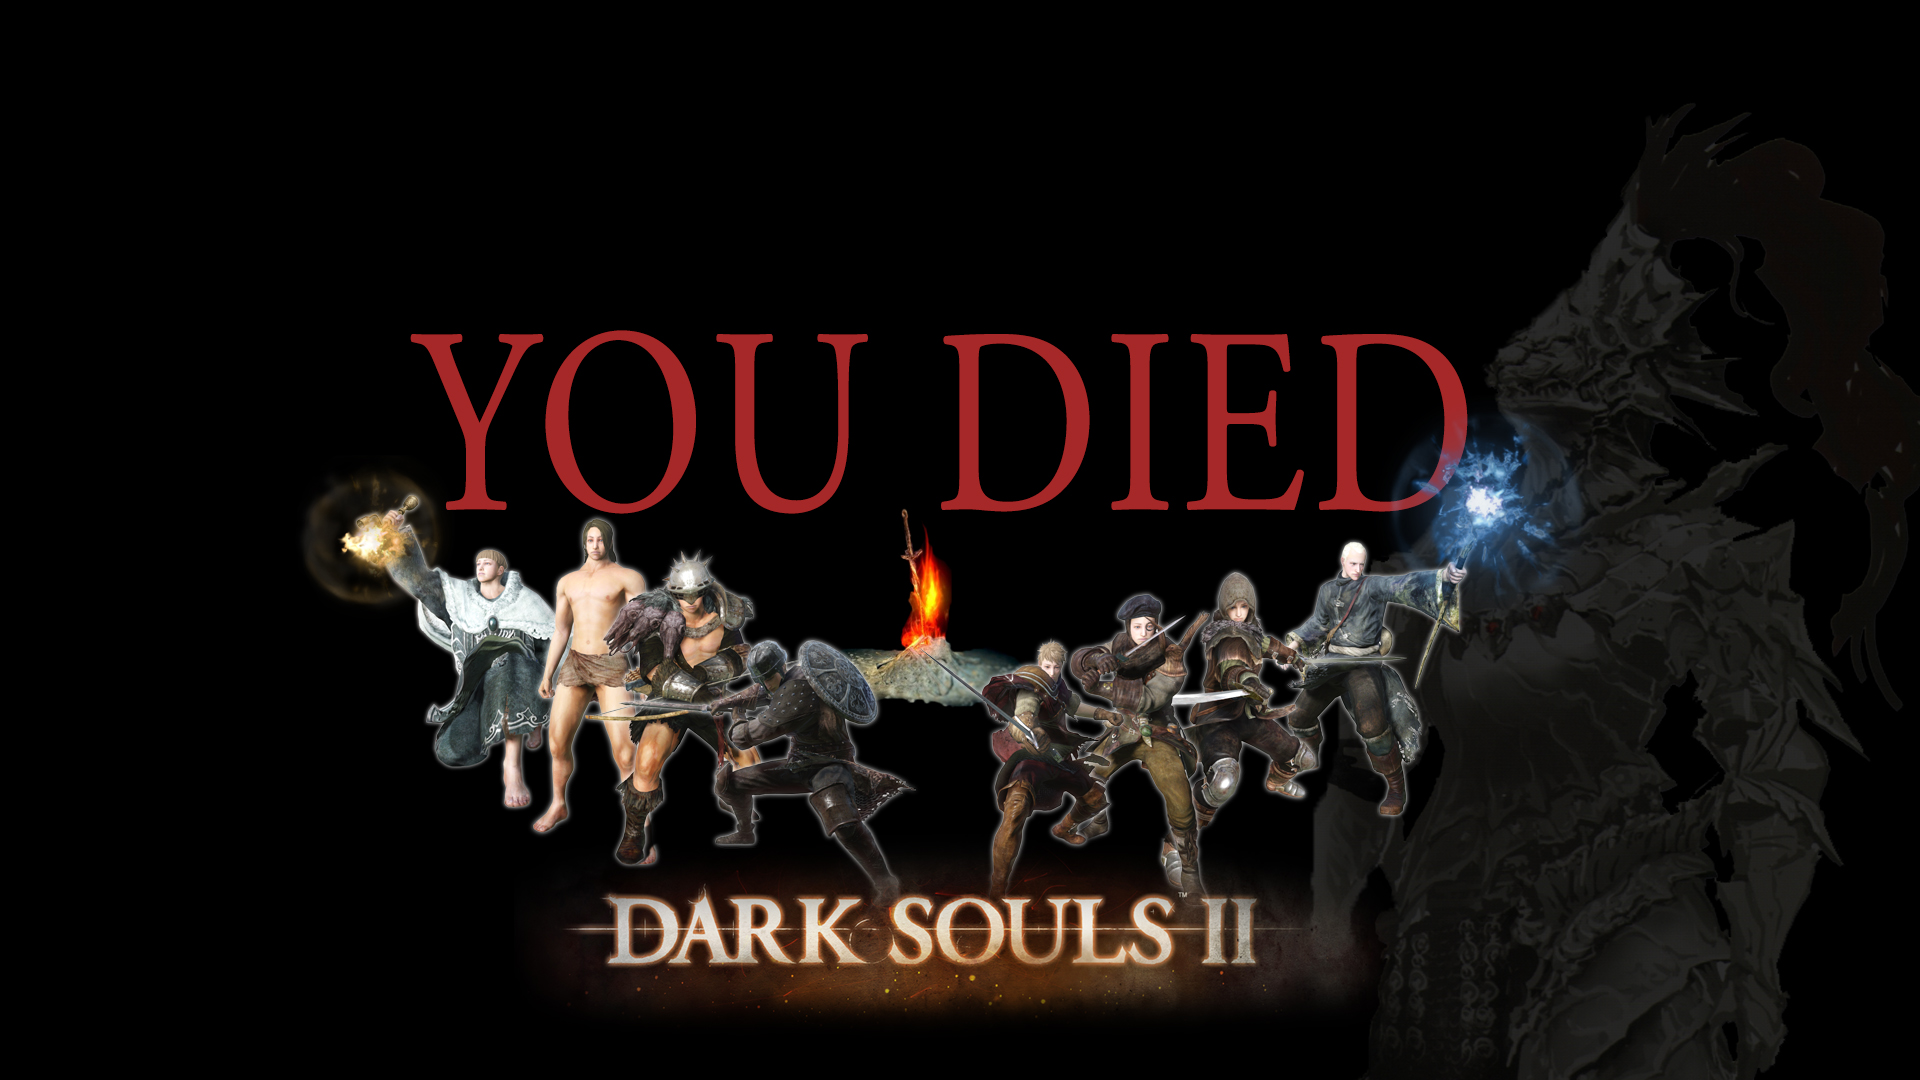 Dark Souls 2 Wallpaper by zupertompa 1920x1080